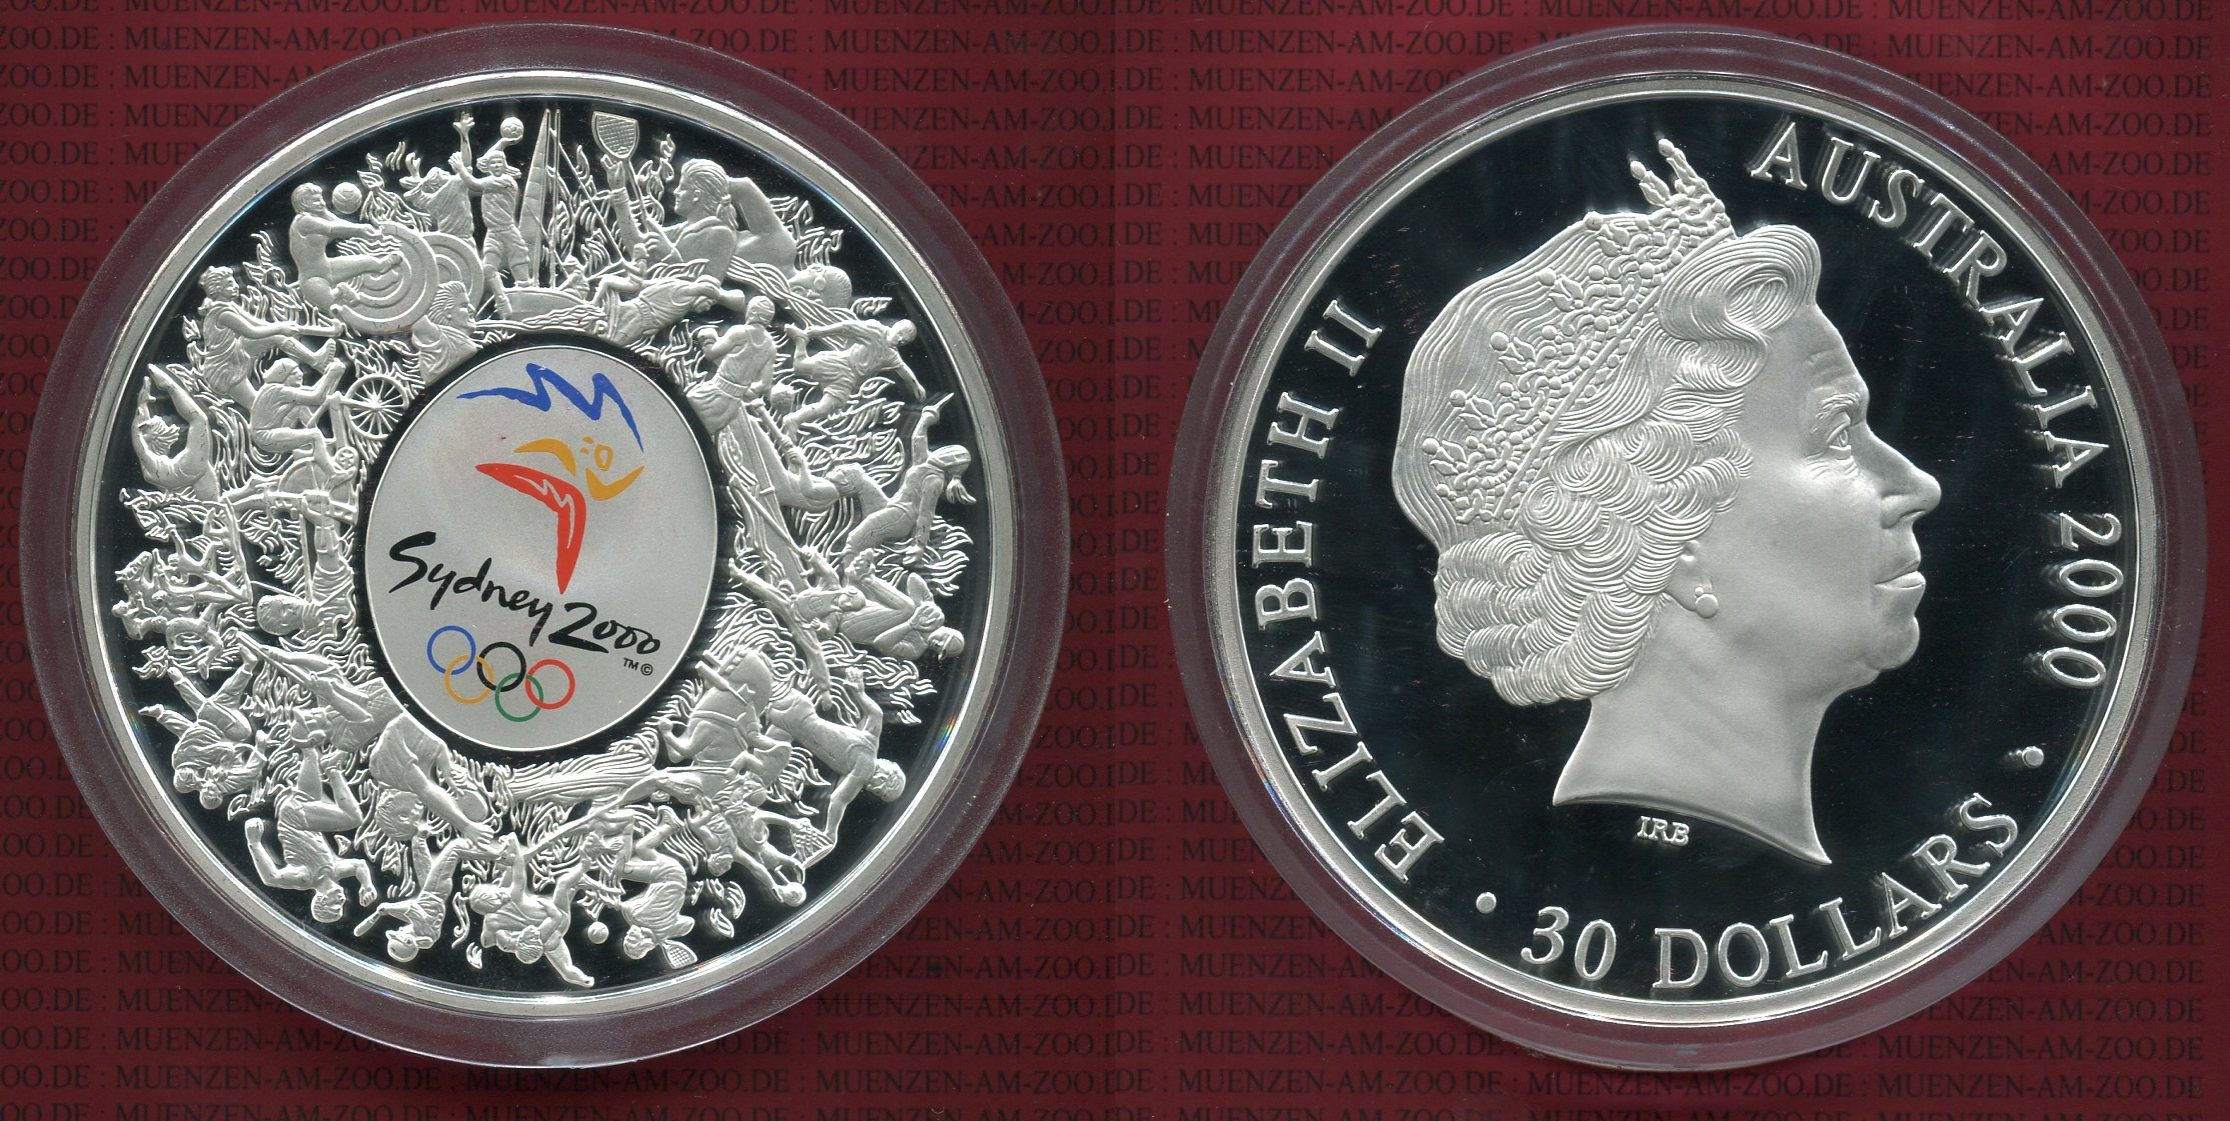 1 Kilo Silber 30 Dollars Farbmünze 2000 Australien Australia